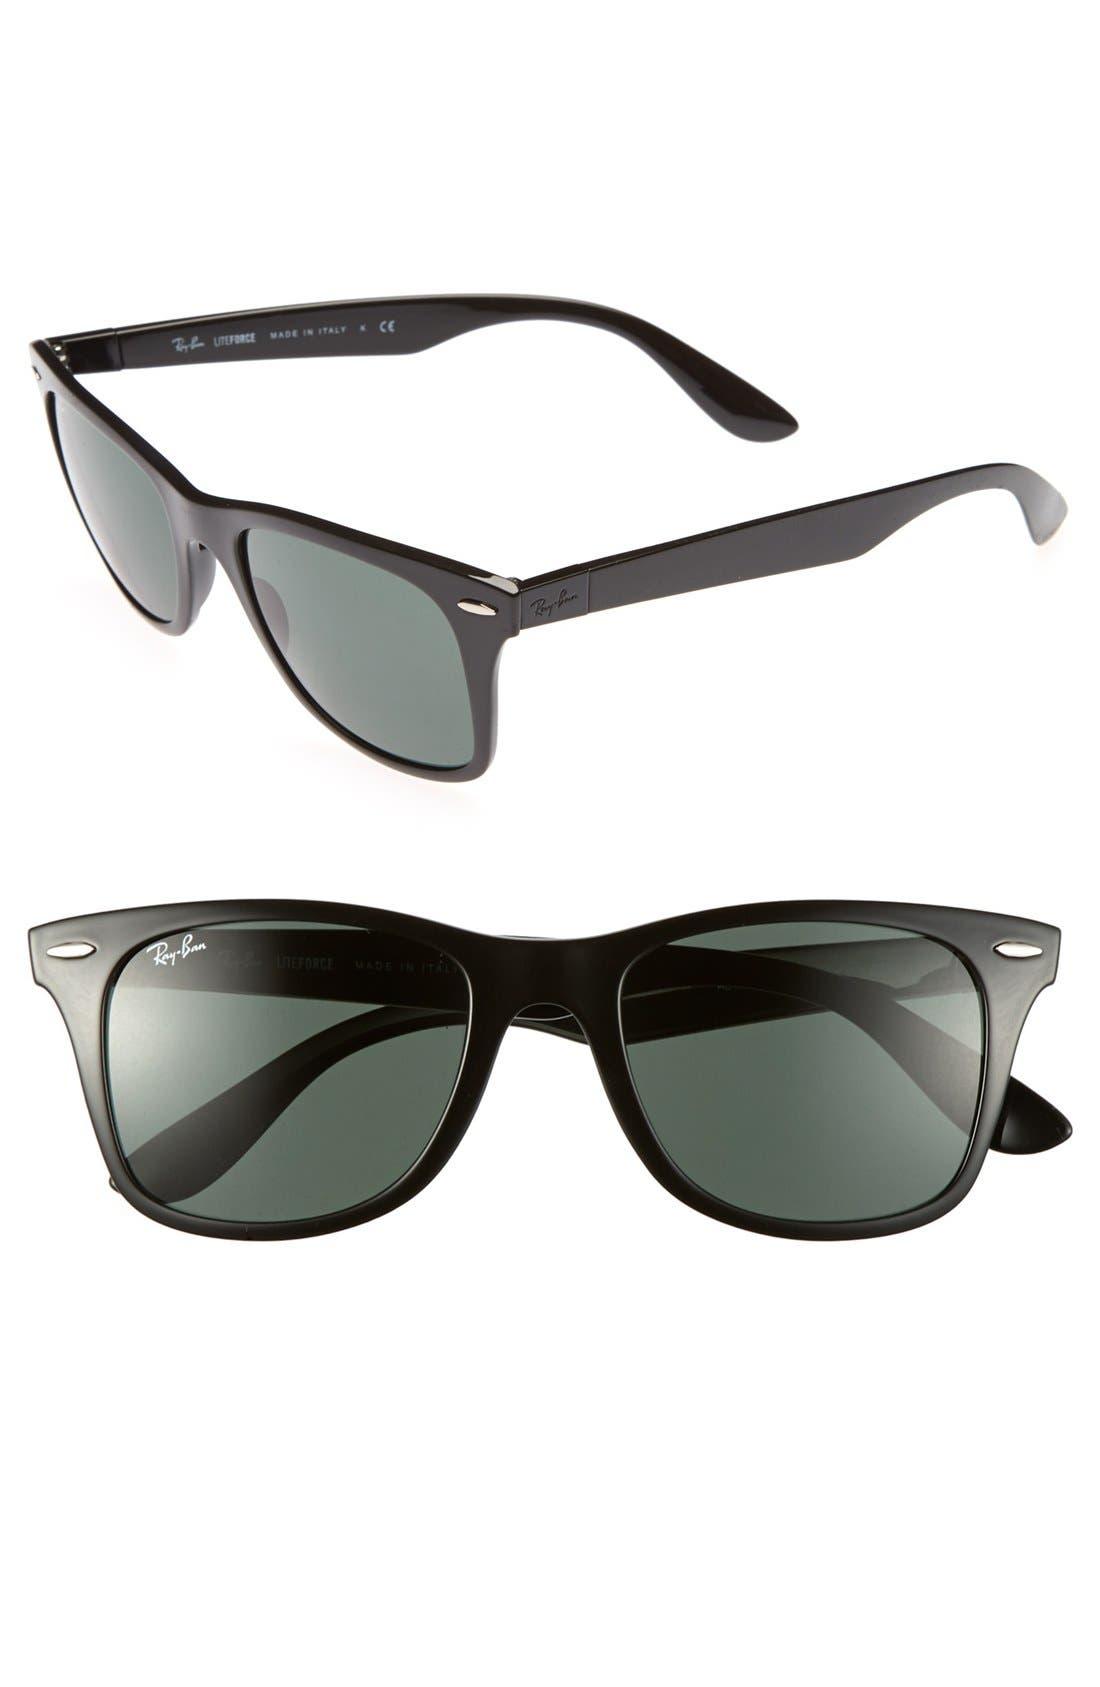 Alternate Image 1 Selected - Ray-Ban 'TECH Liteforce - Wayfarer' Sunglasses